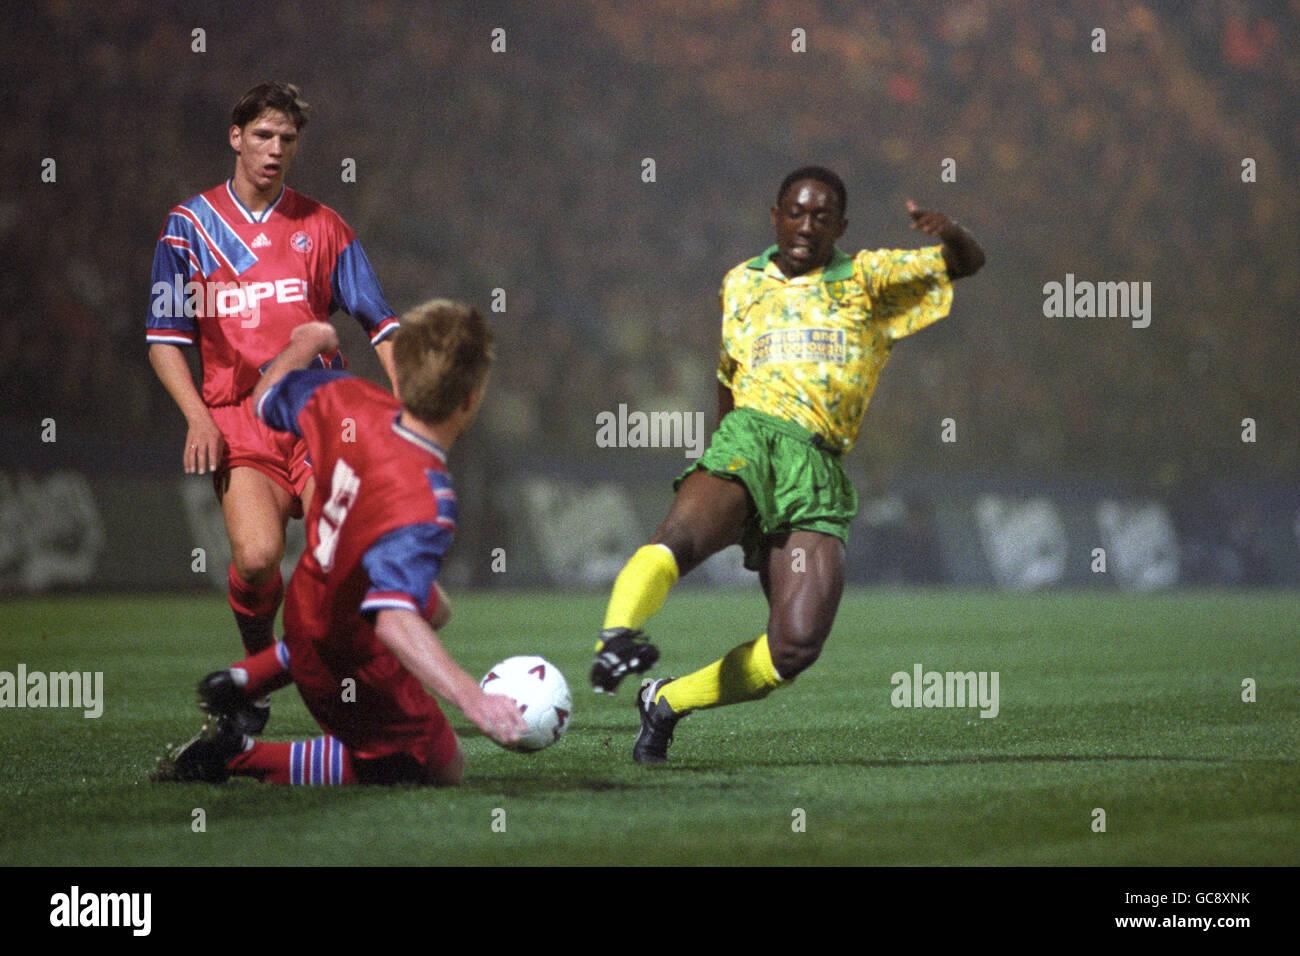 Thomas Helmer Bayern Munich And Ruel Fox Norwich City